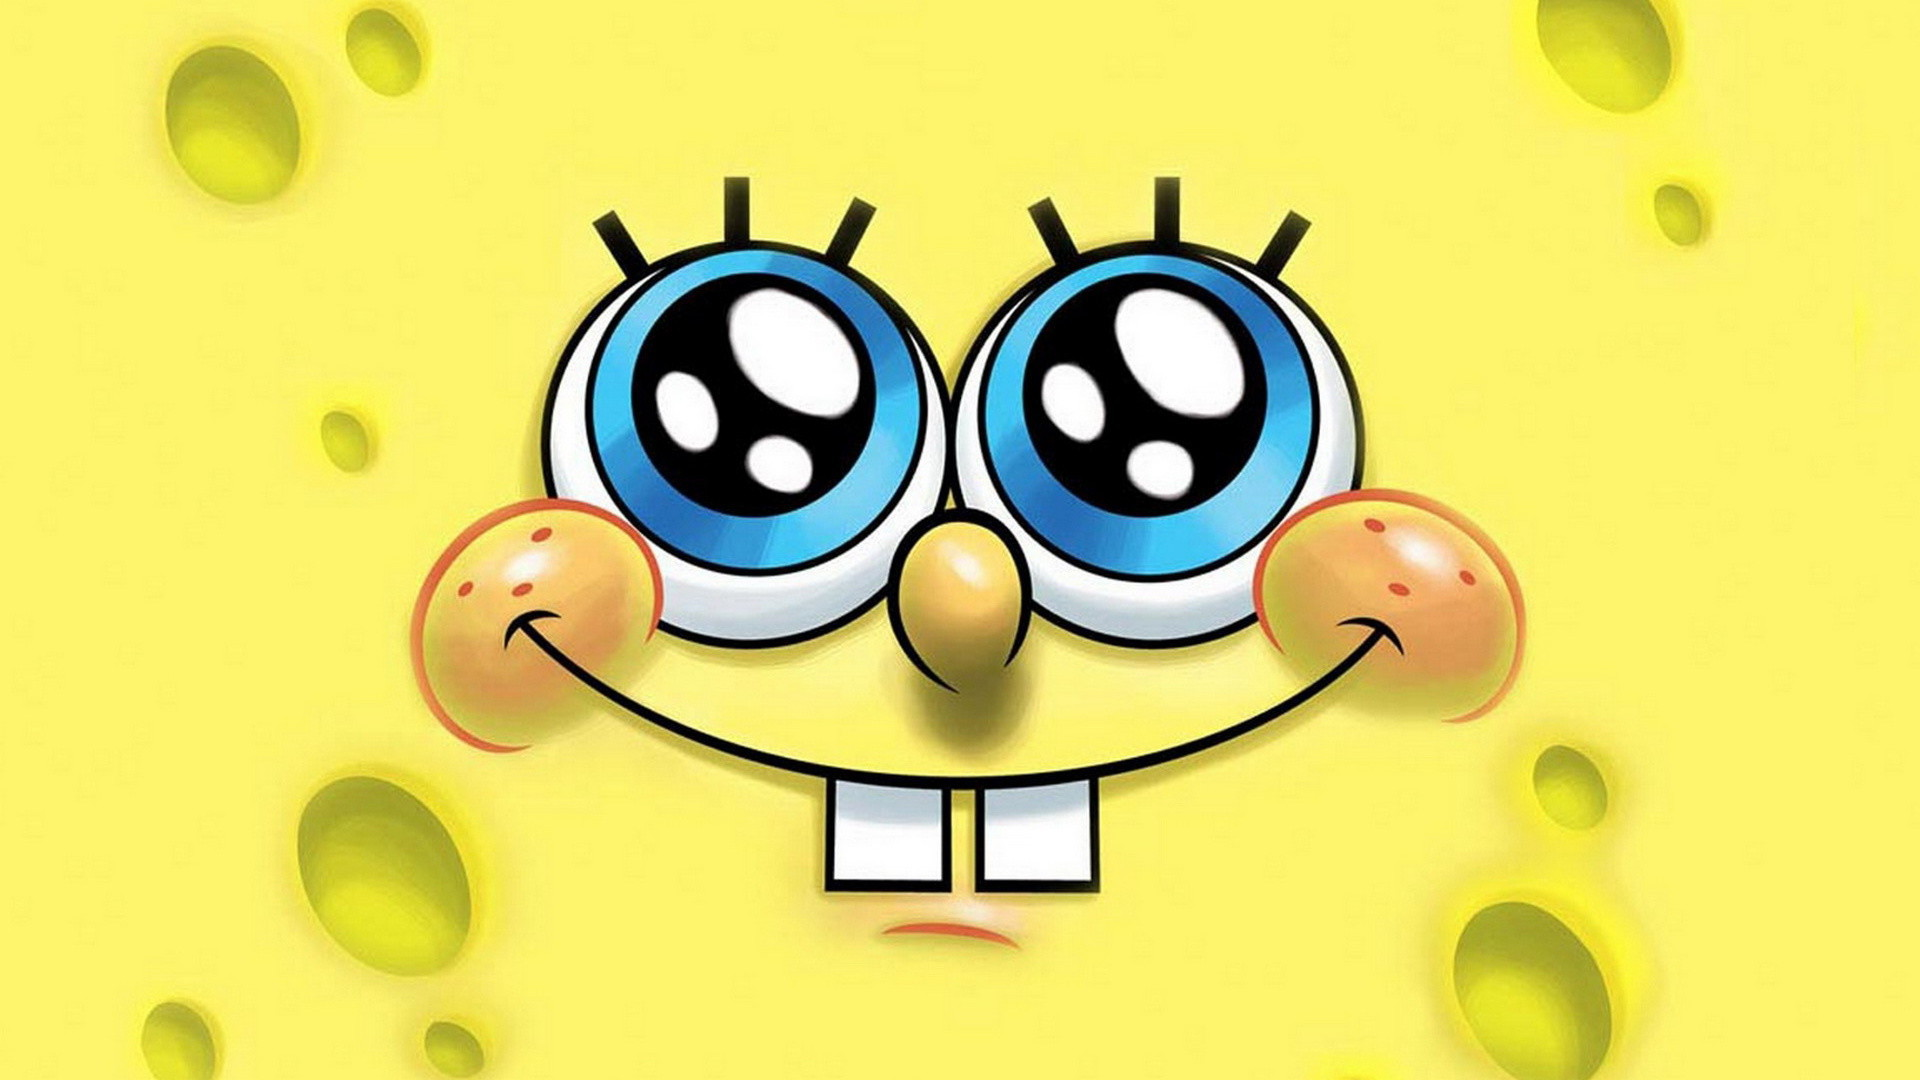 cute spongebob wallpaper hd pixelstalk cute spongebob spongebob